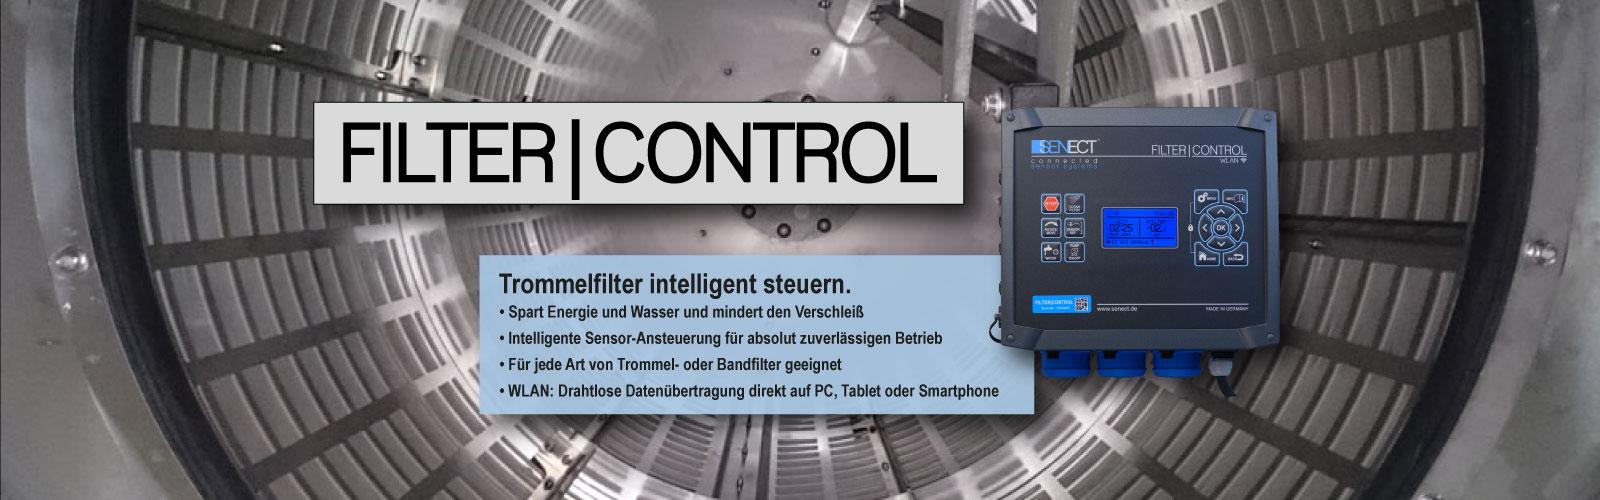 Slider_FilterControl_2